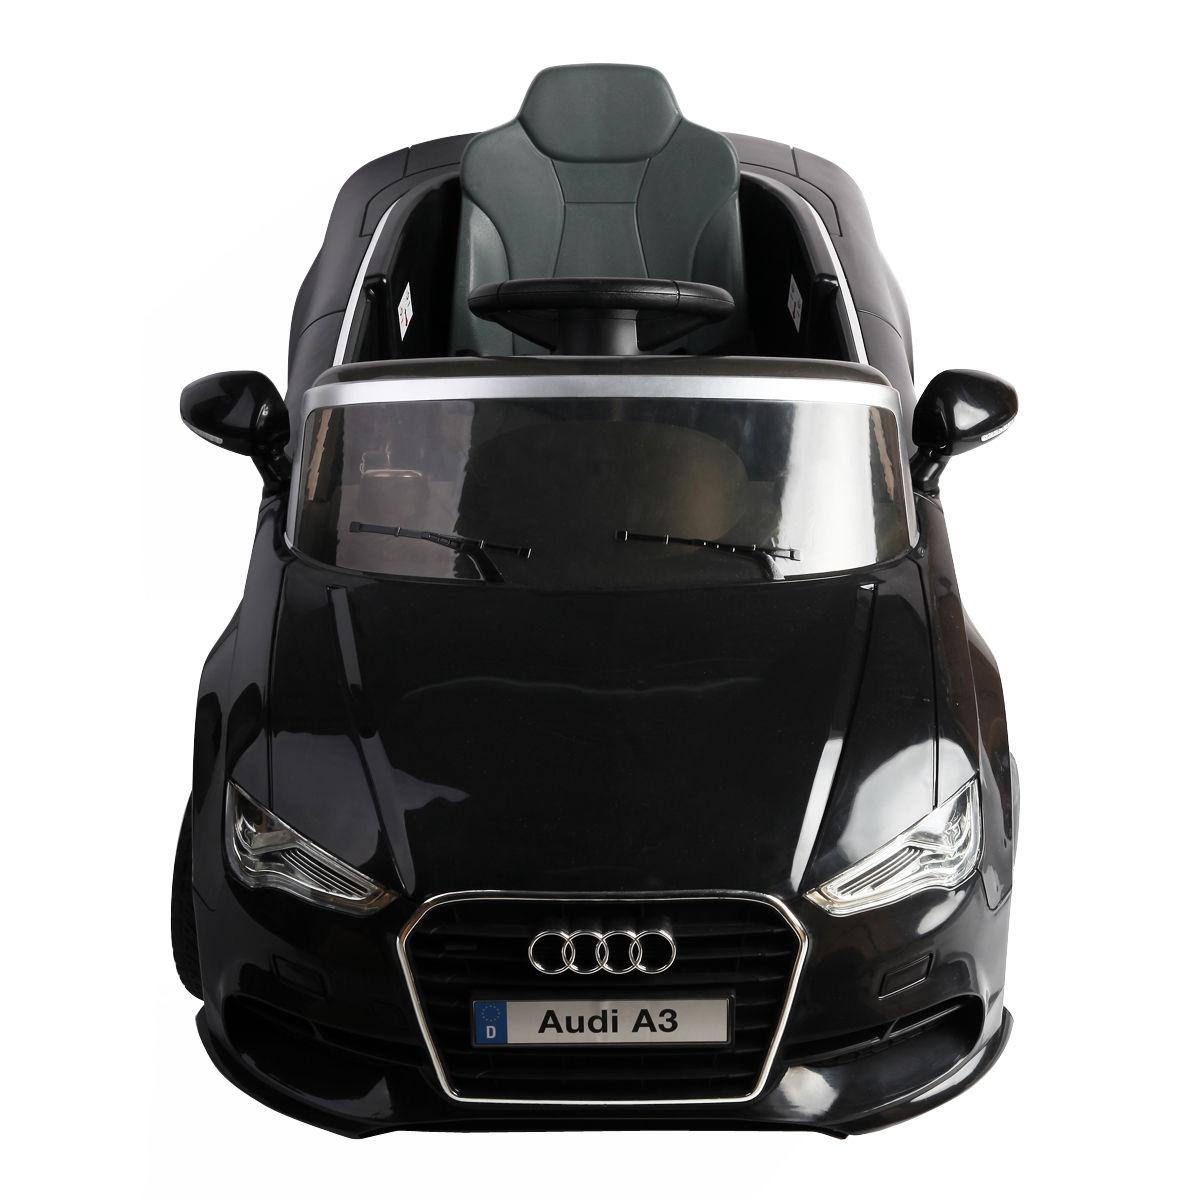 12V Audi A3 Licensed RC Kids Ride On Car Electric Remote Control LED Light Music-Black